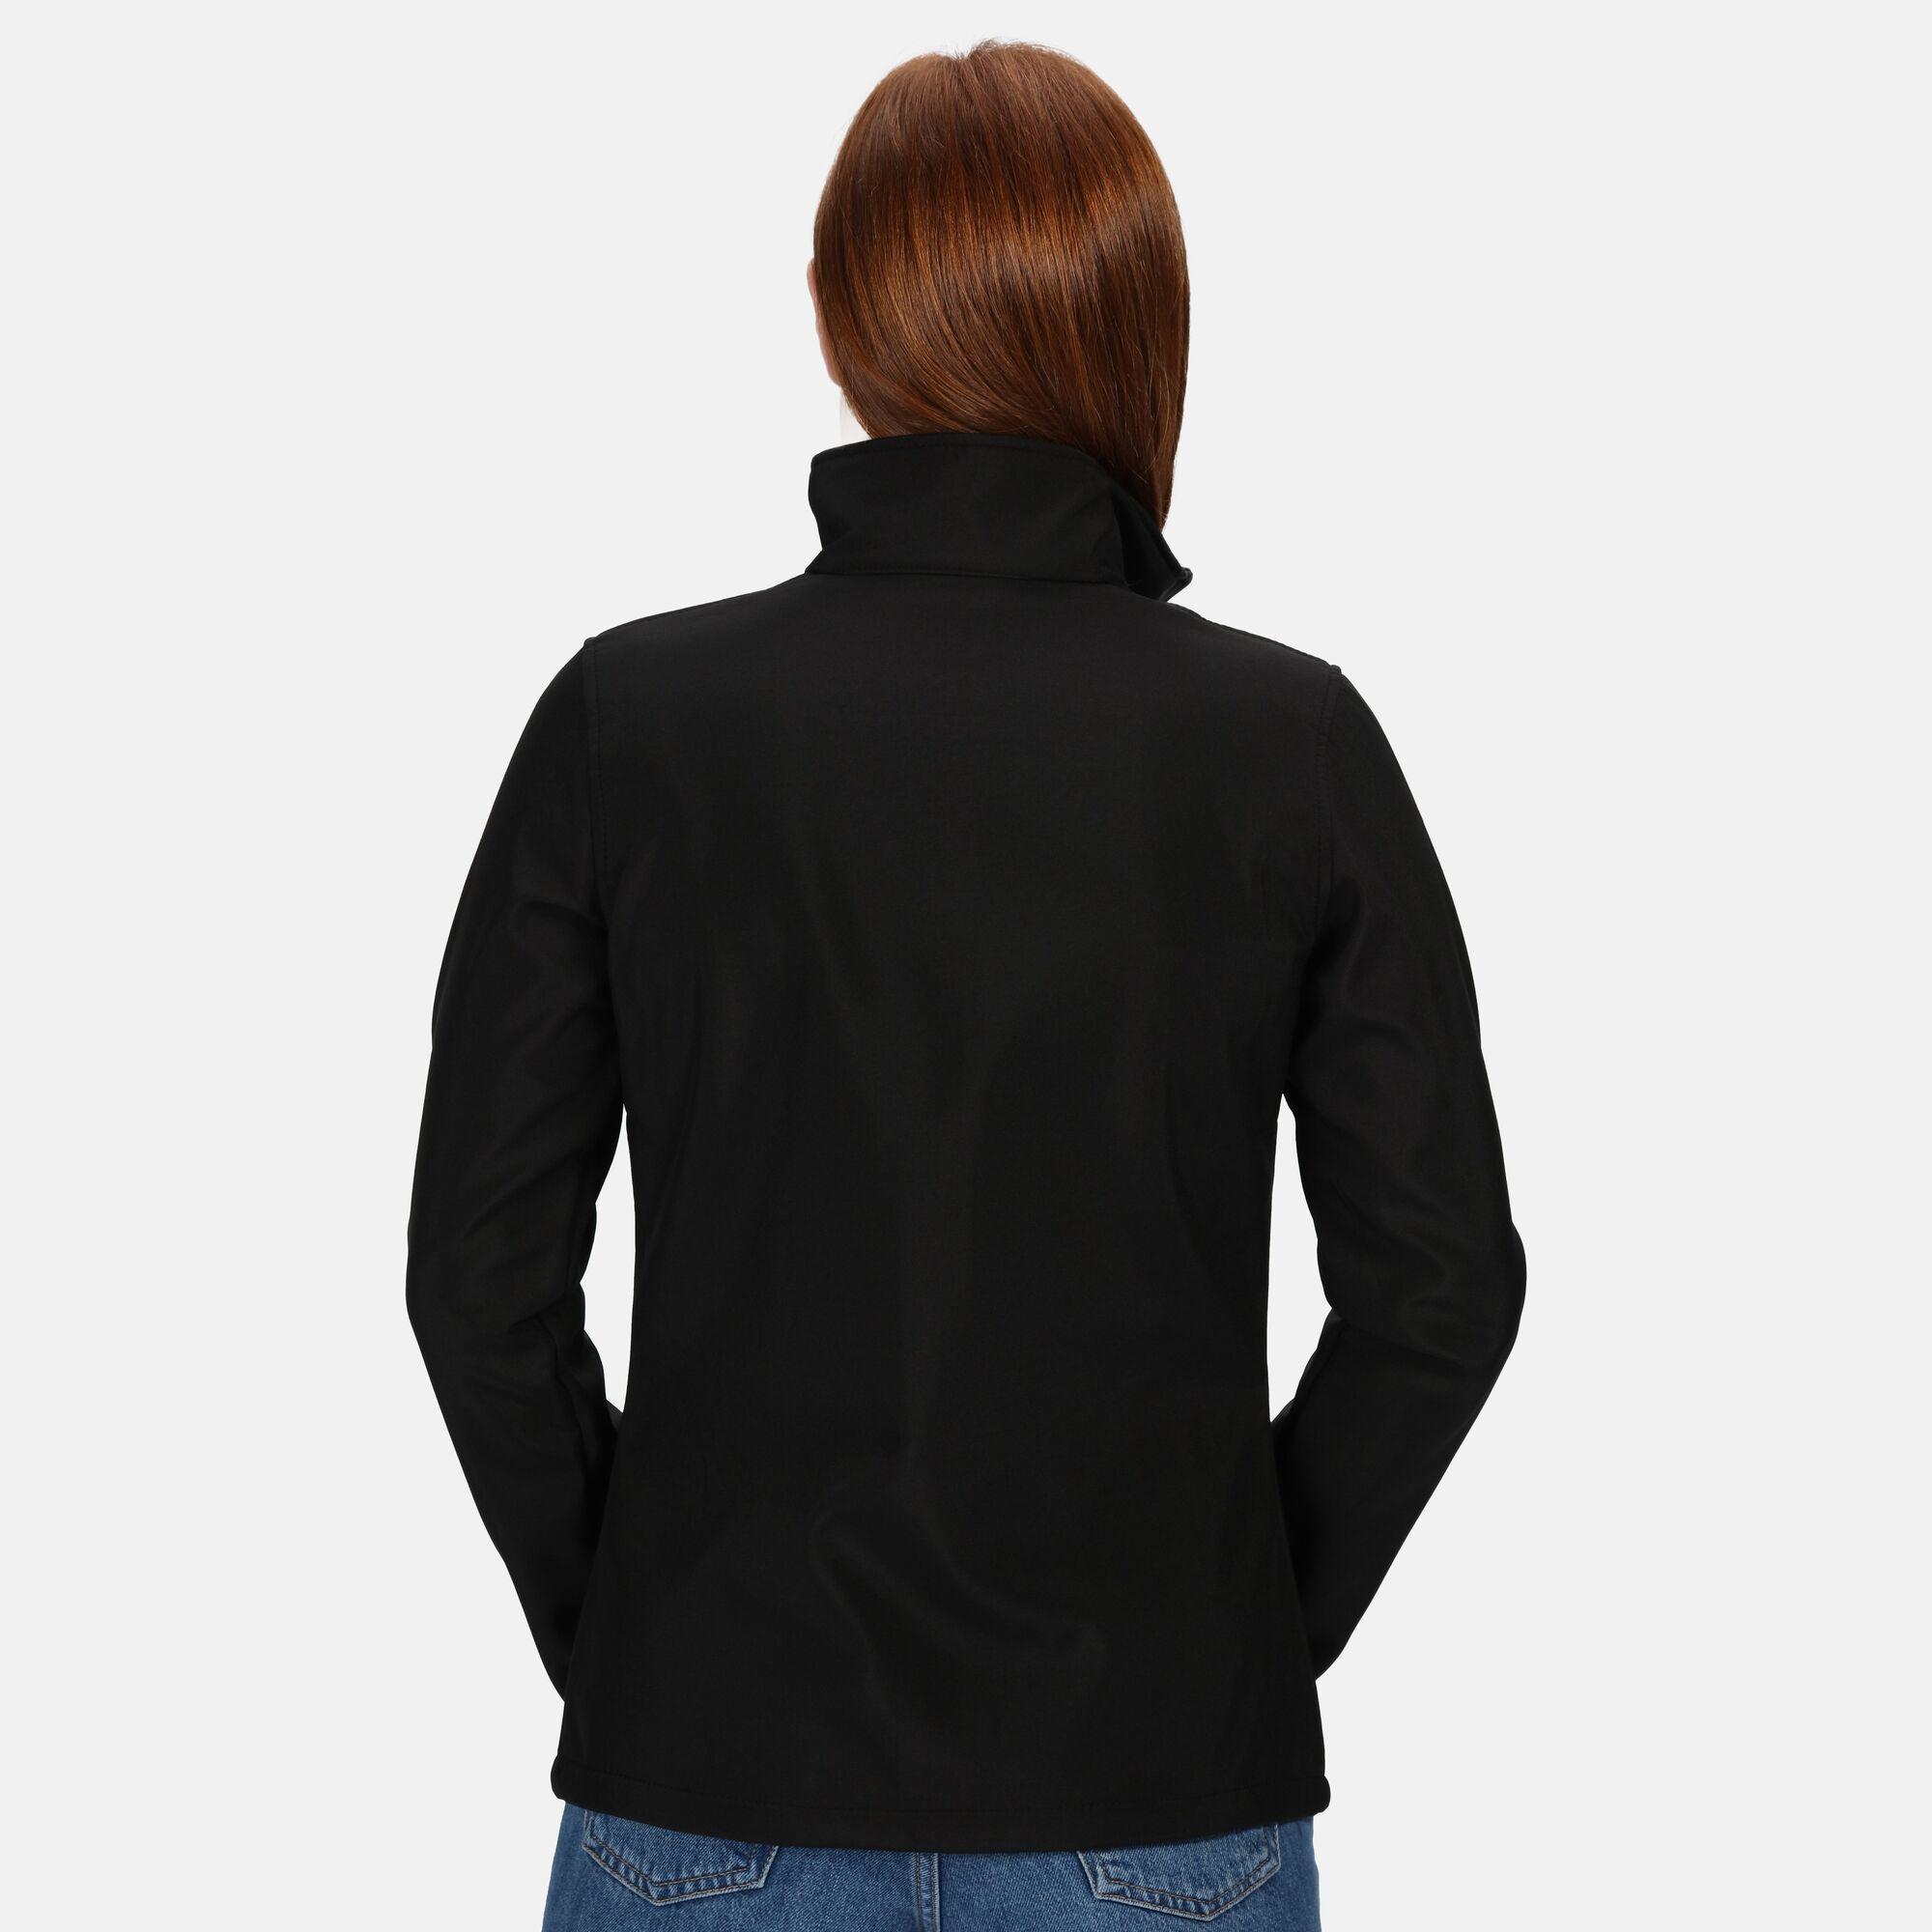 Regatta Standout Womens/Ladies Ablaze Printable Soft Shell Jacket (10) (Dark Spruce/Black)